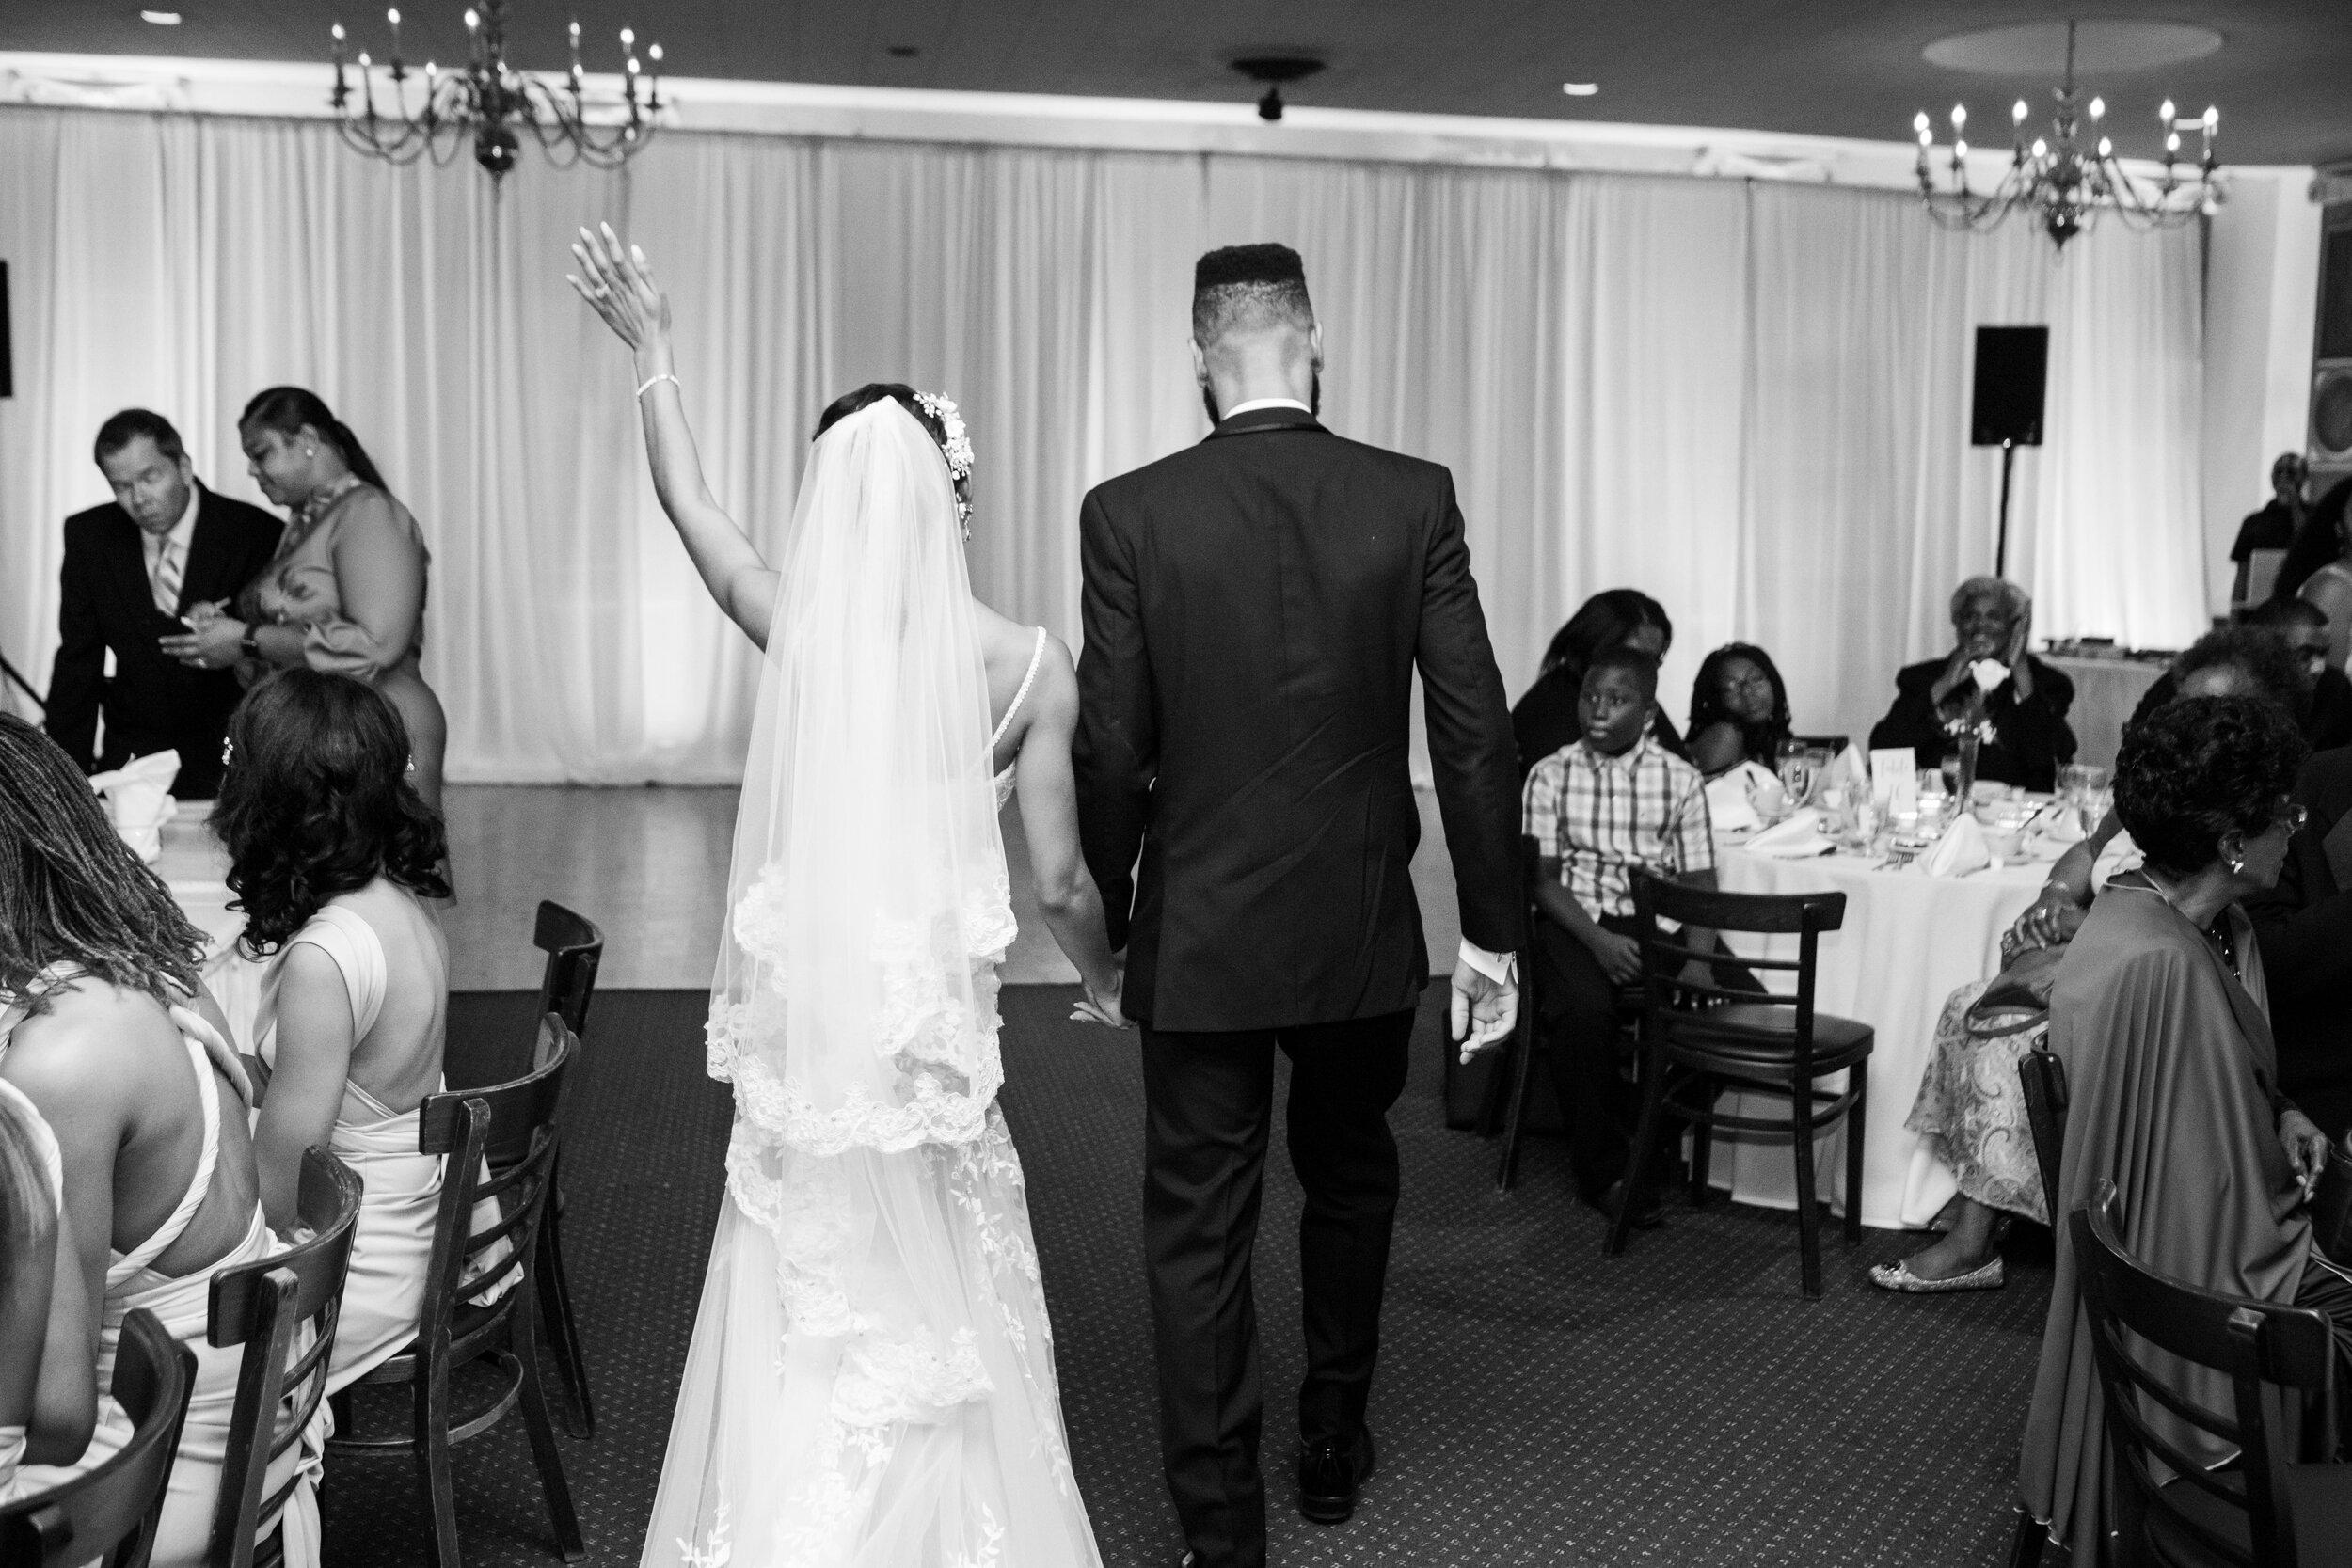 8_3_2019_BONTY_WEDDING-684.jpg